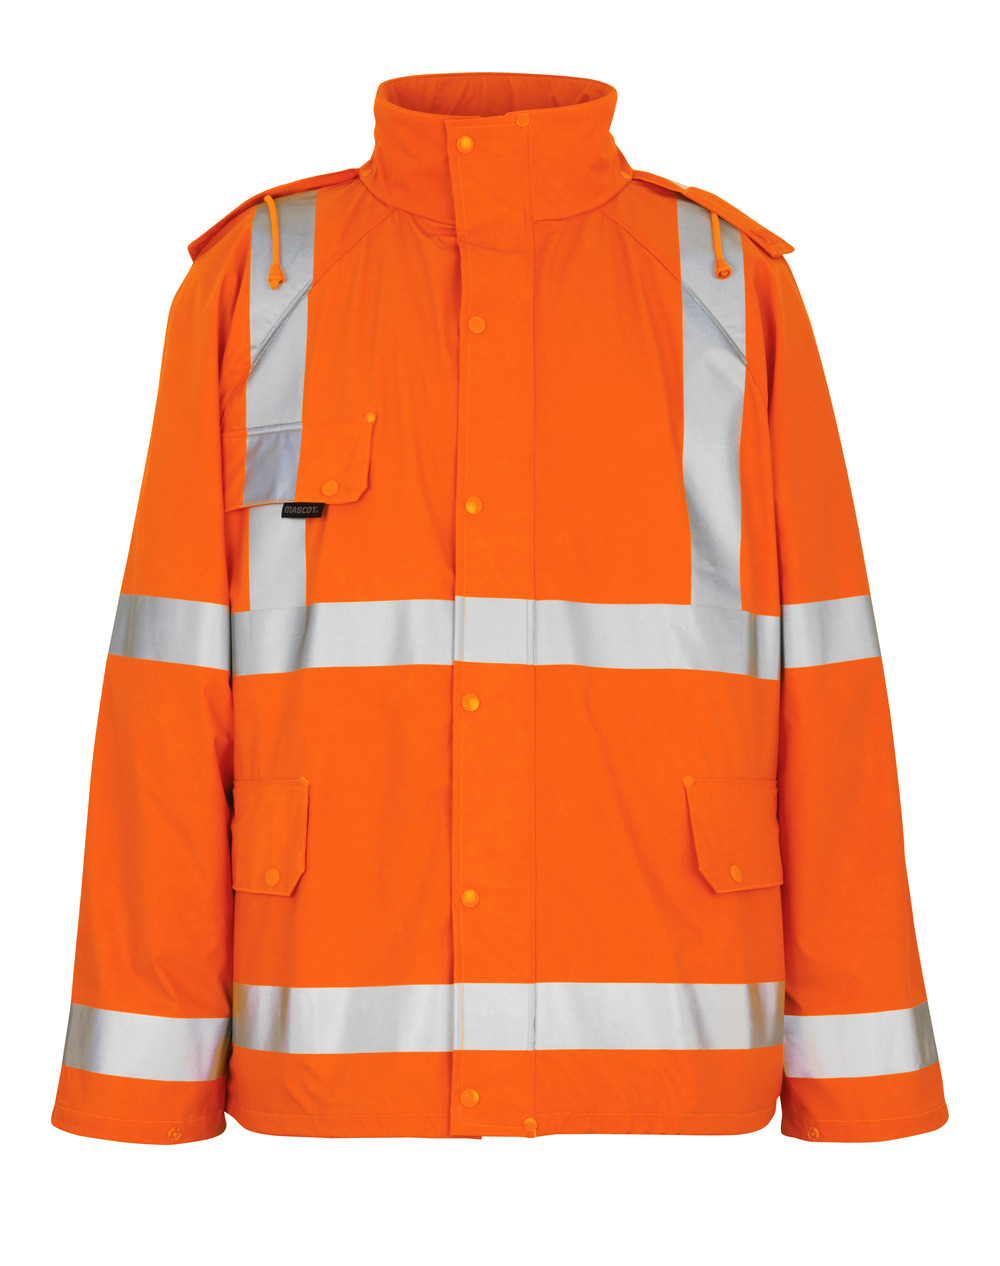 50101-814-14 Rain Jacket - hi-vis orange